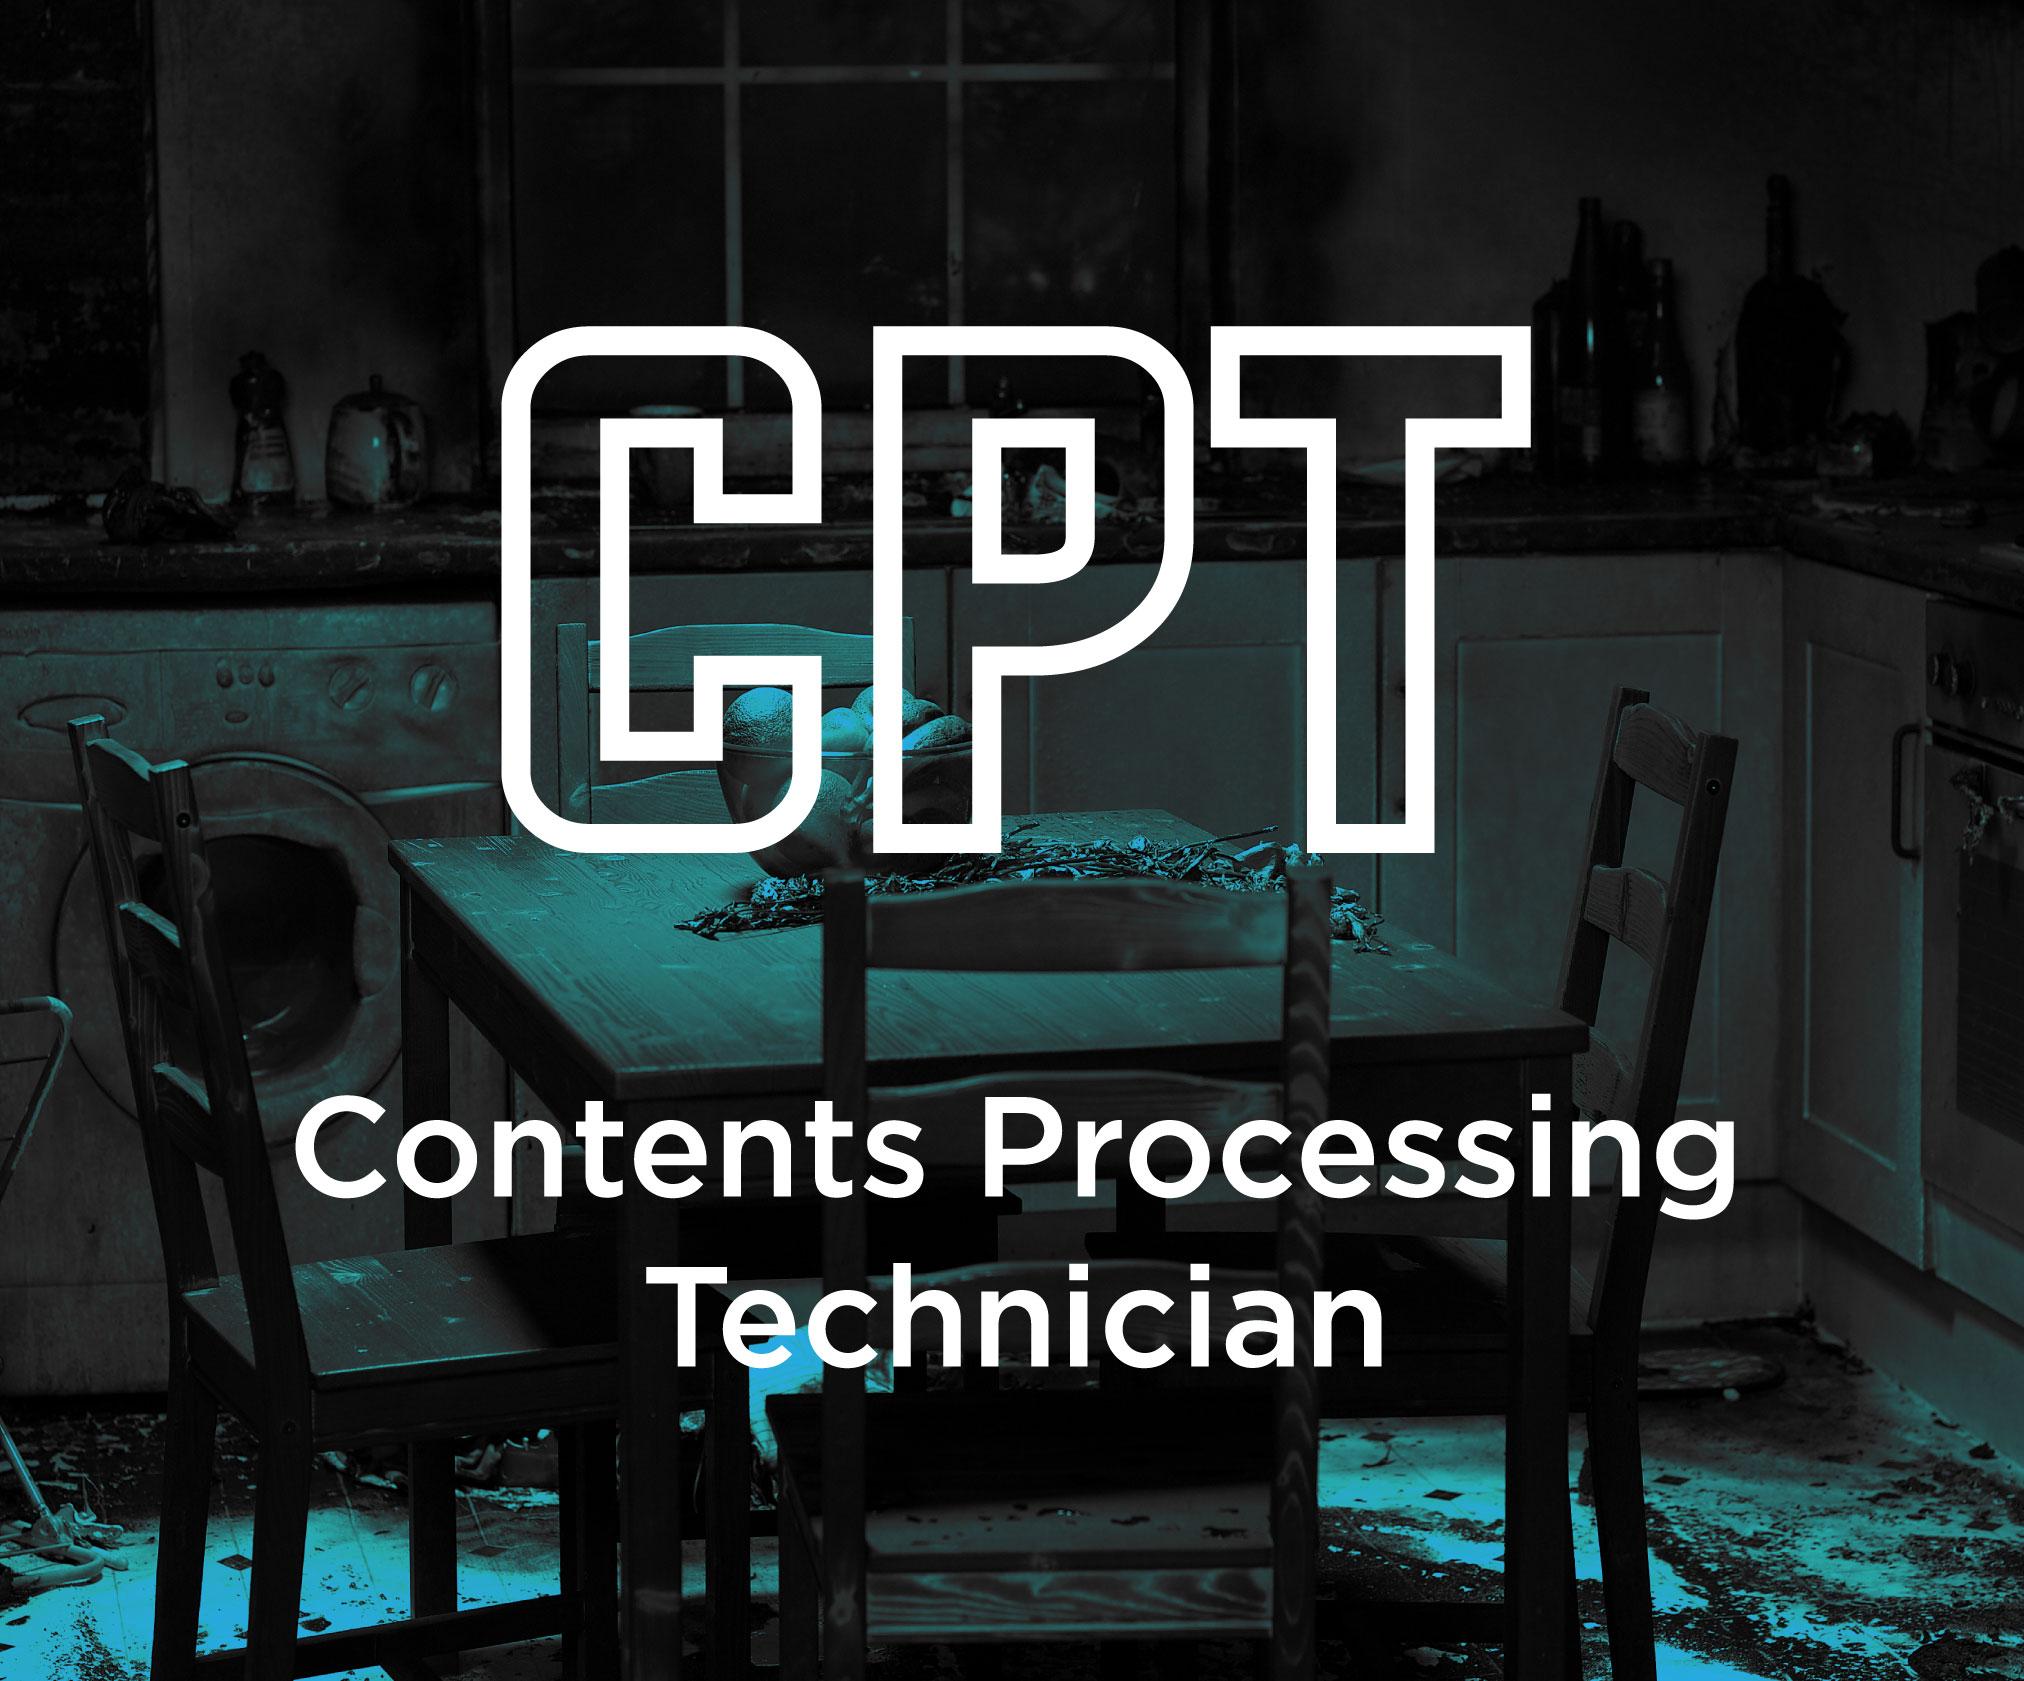 IICRC Contents Processing Technician